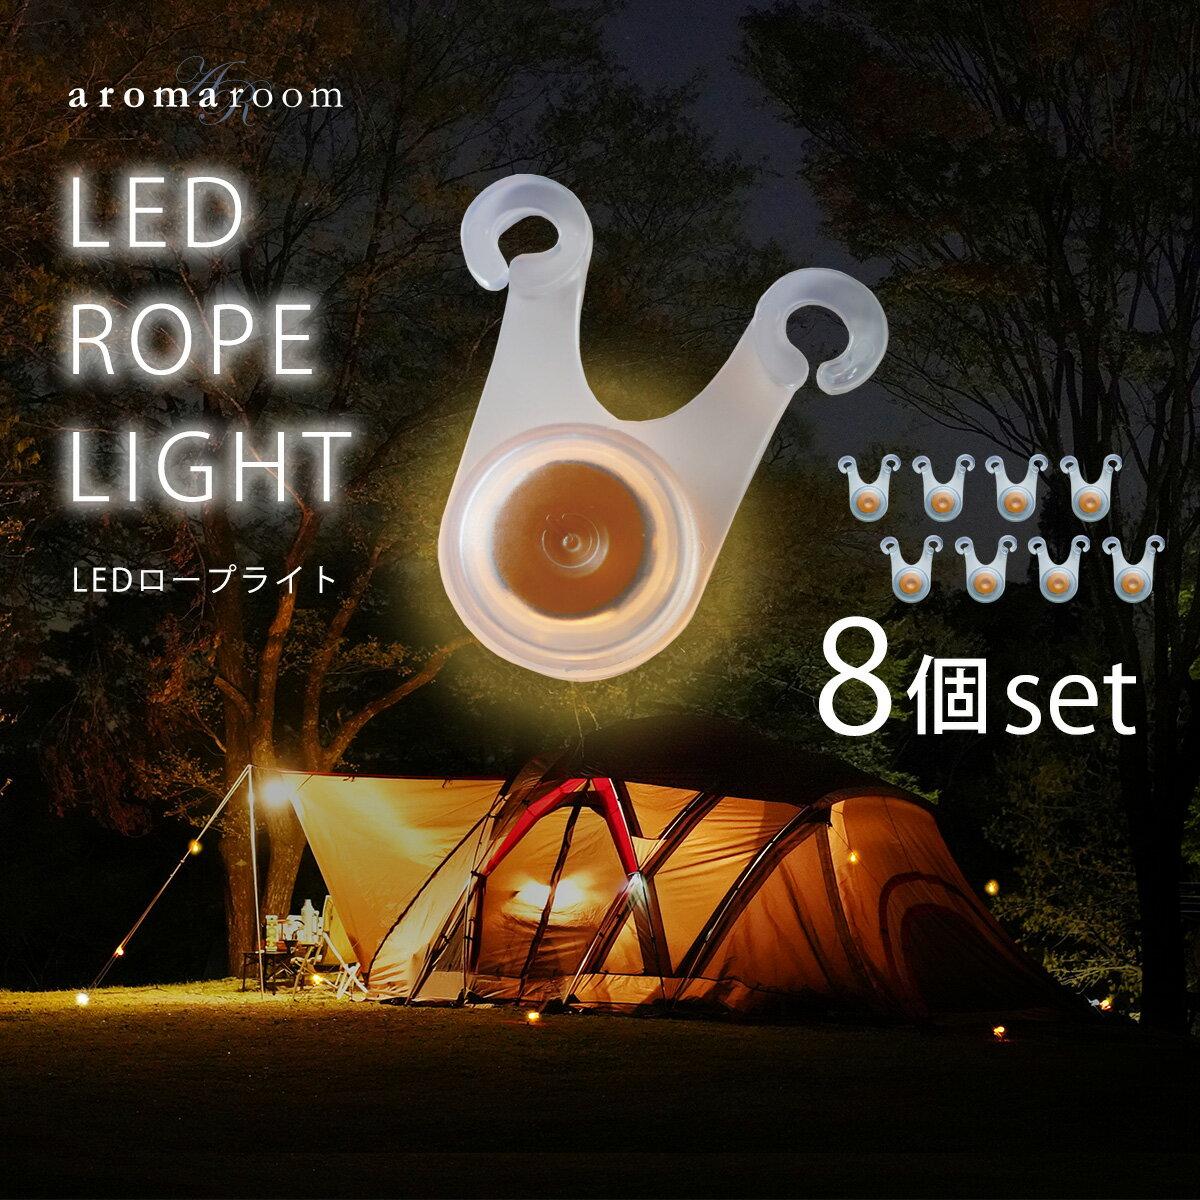 【LEDテントロープライト】